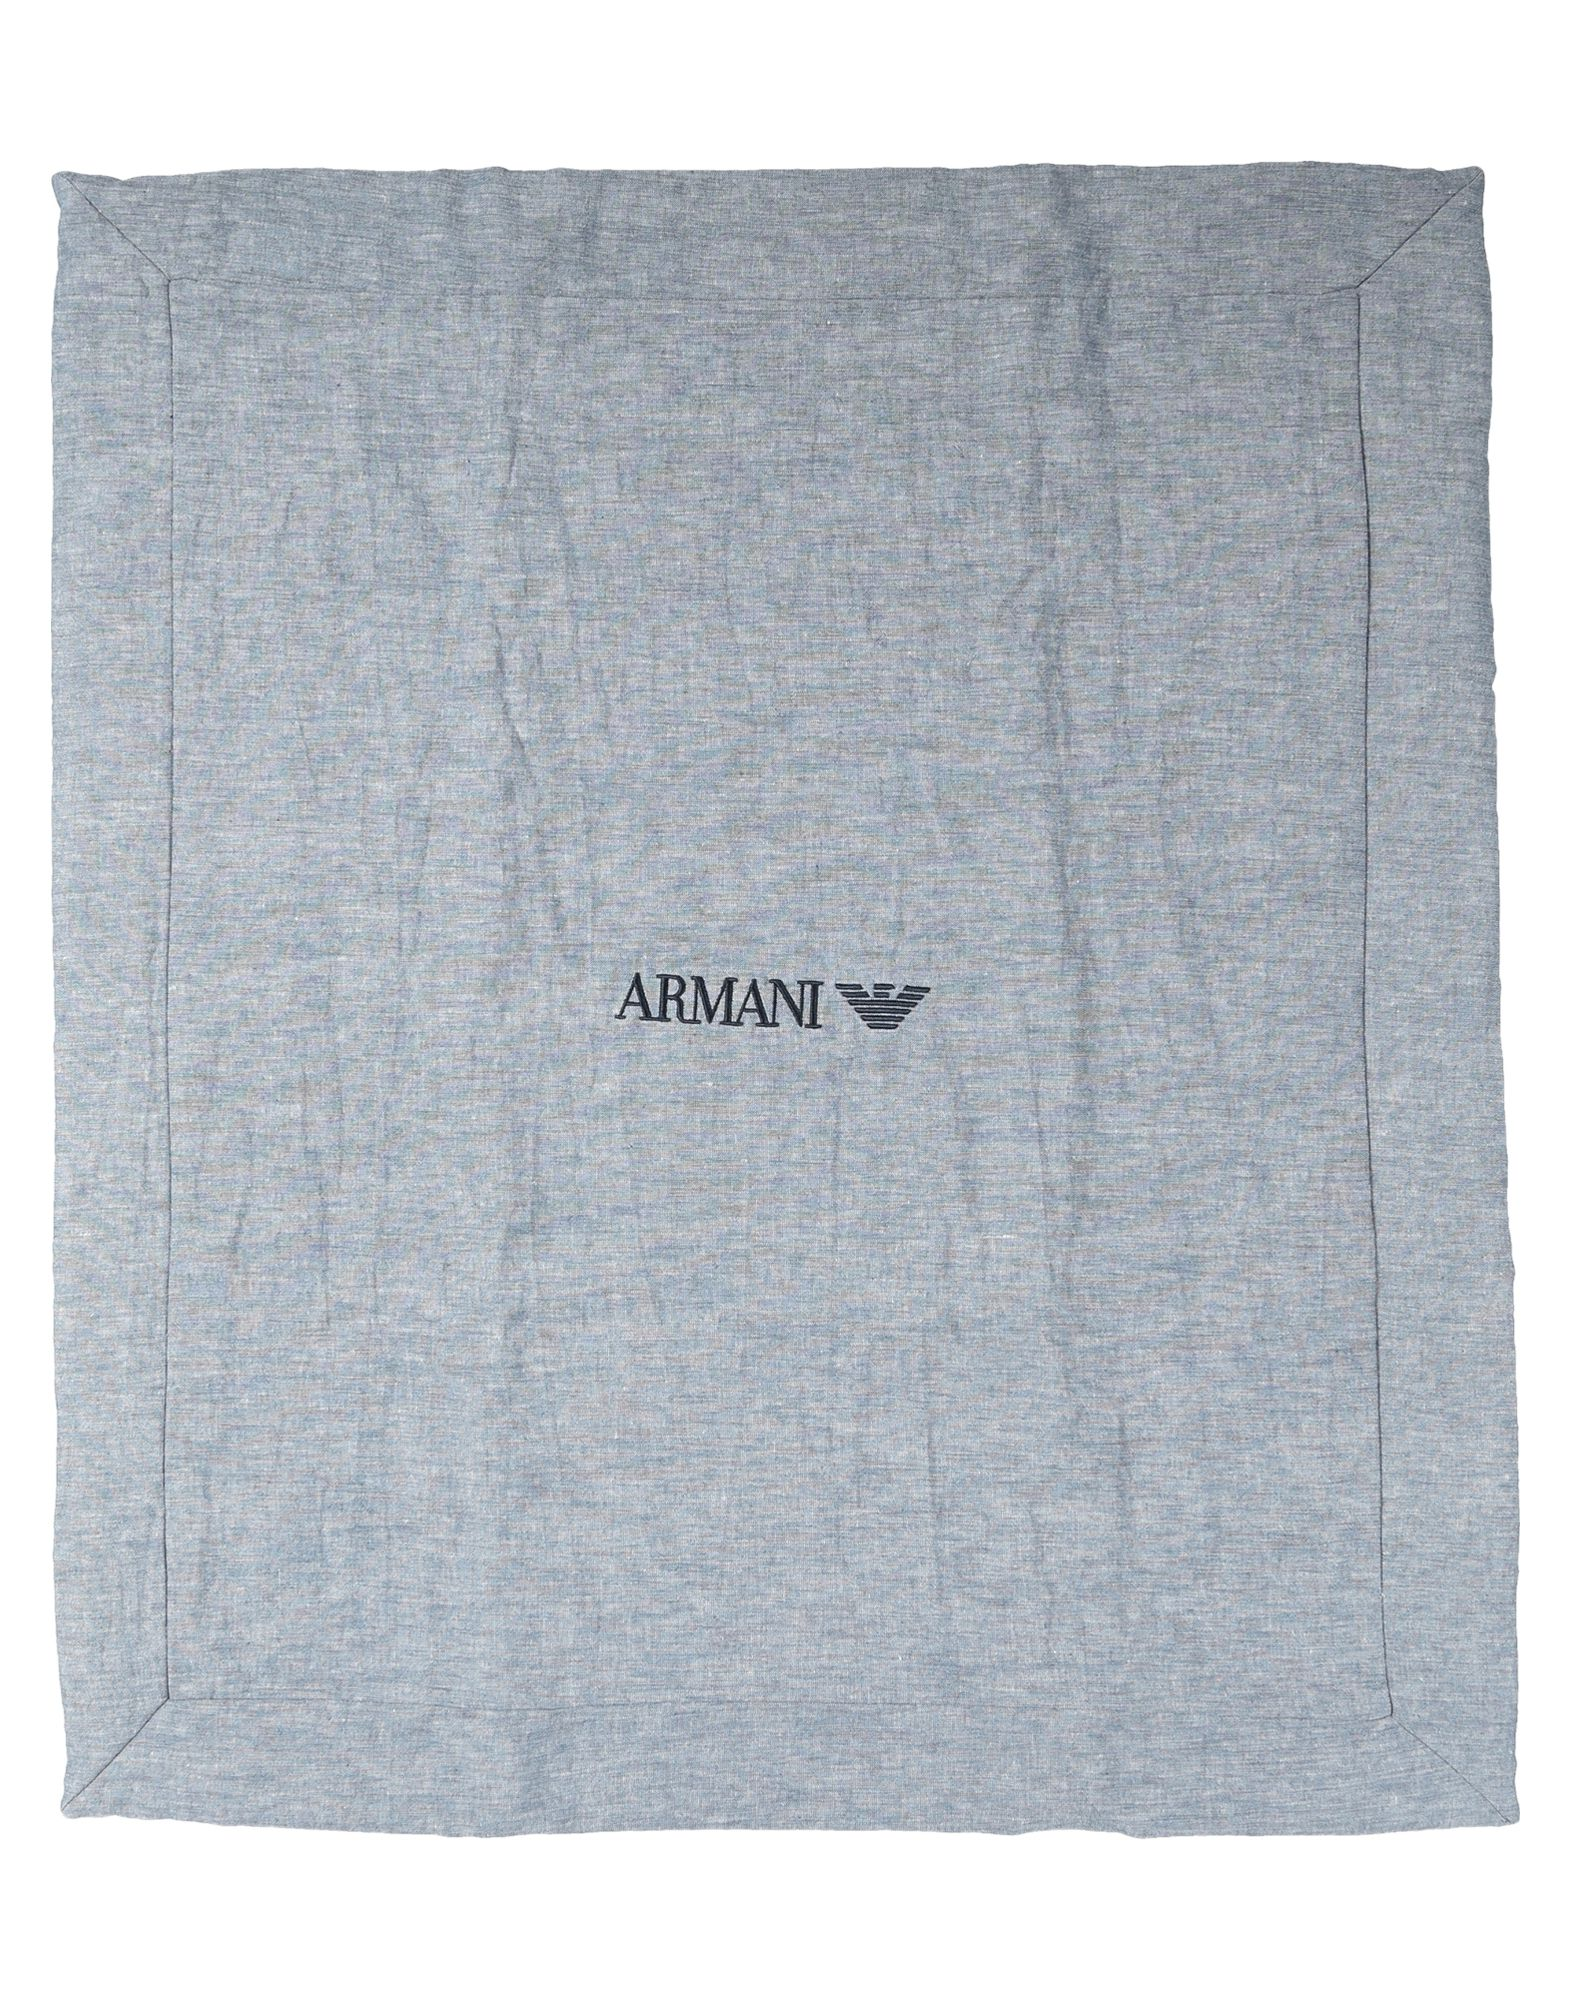 ARMANI JUNIOR Одеяльце для младенцев armani junior одеяльце для младенцев